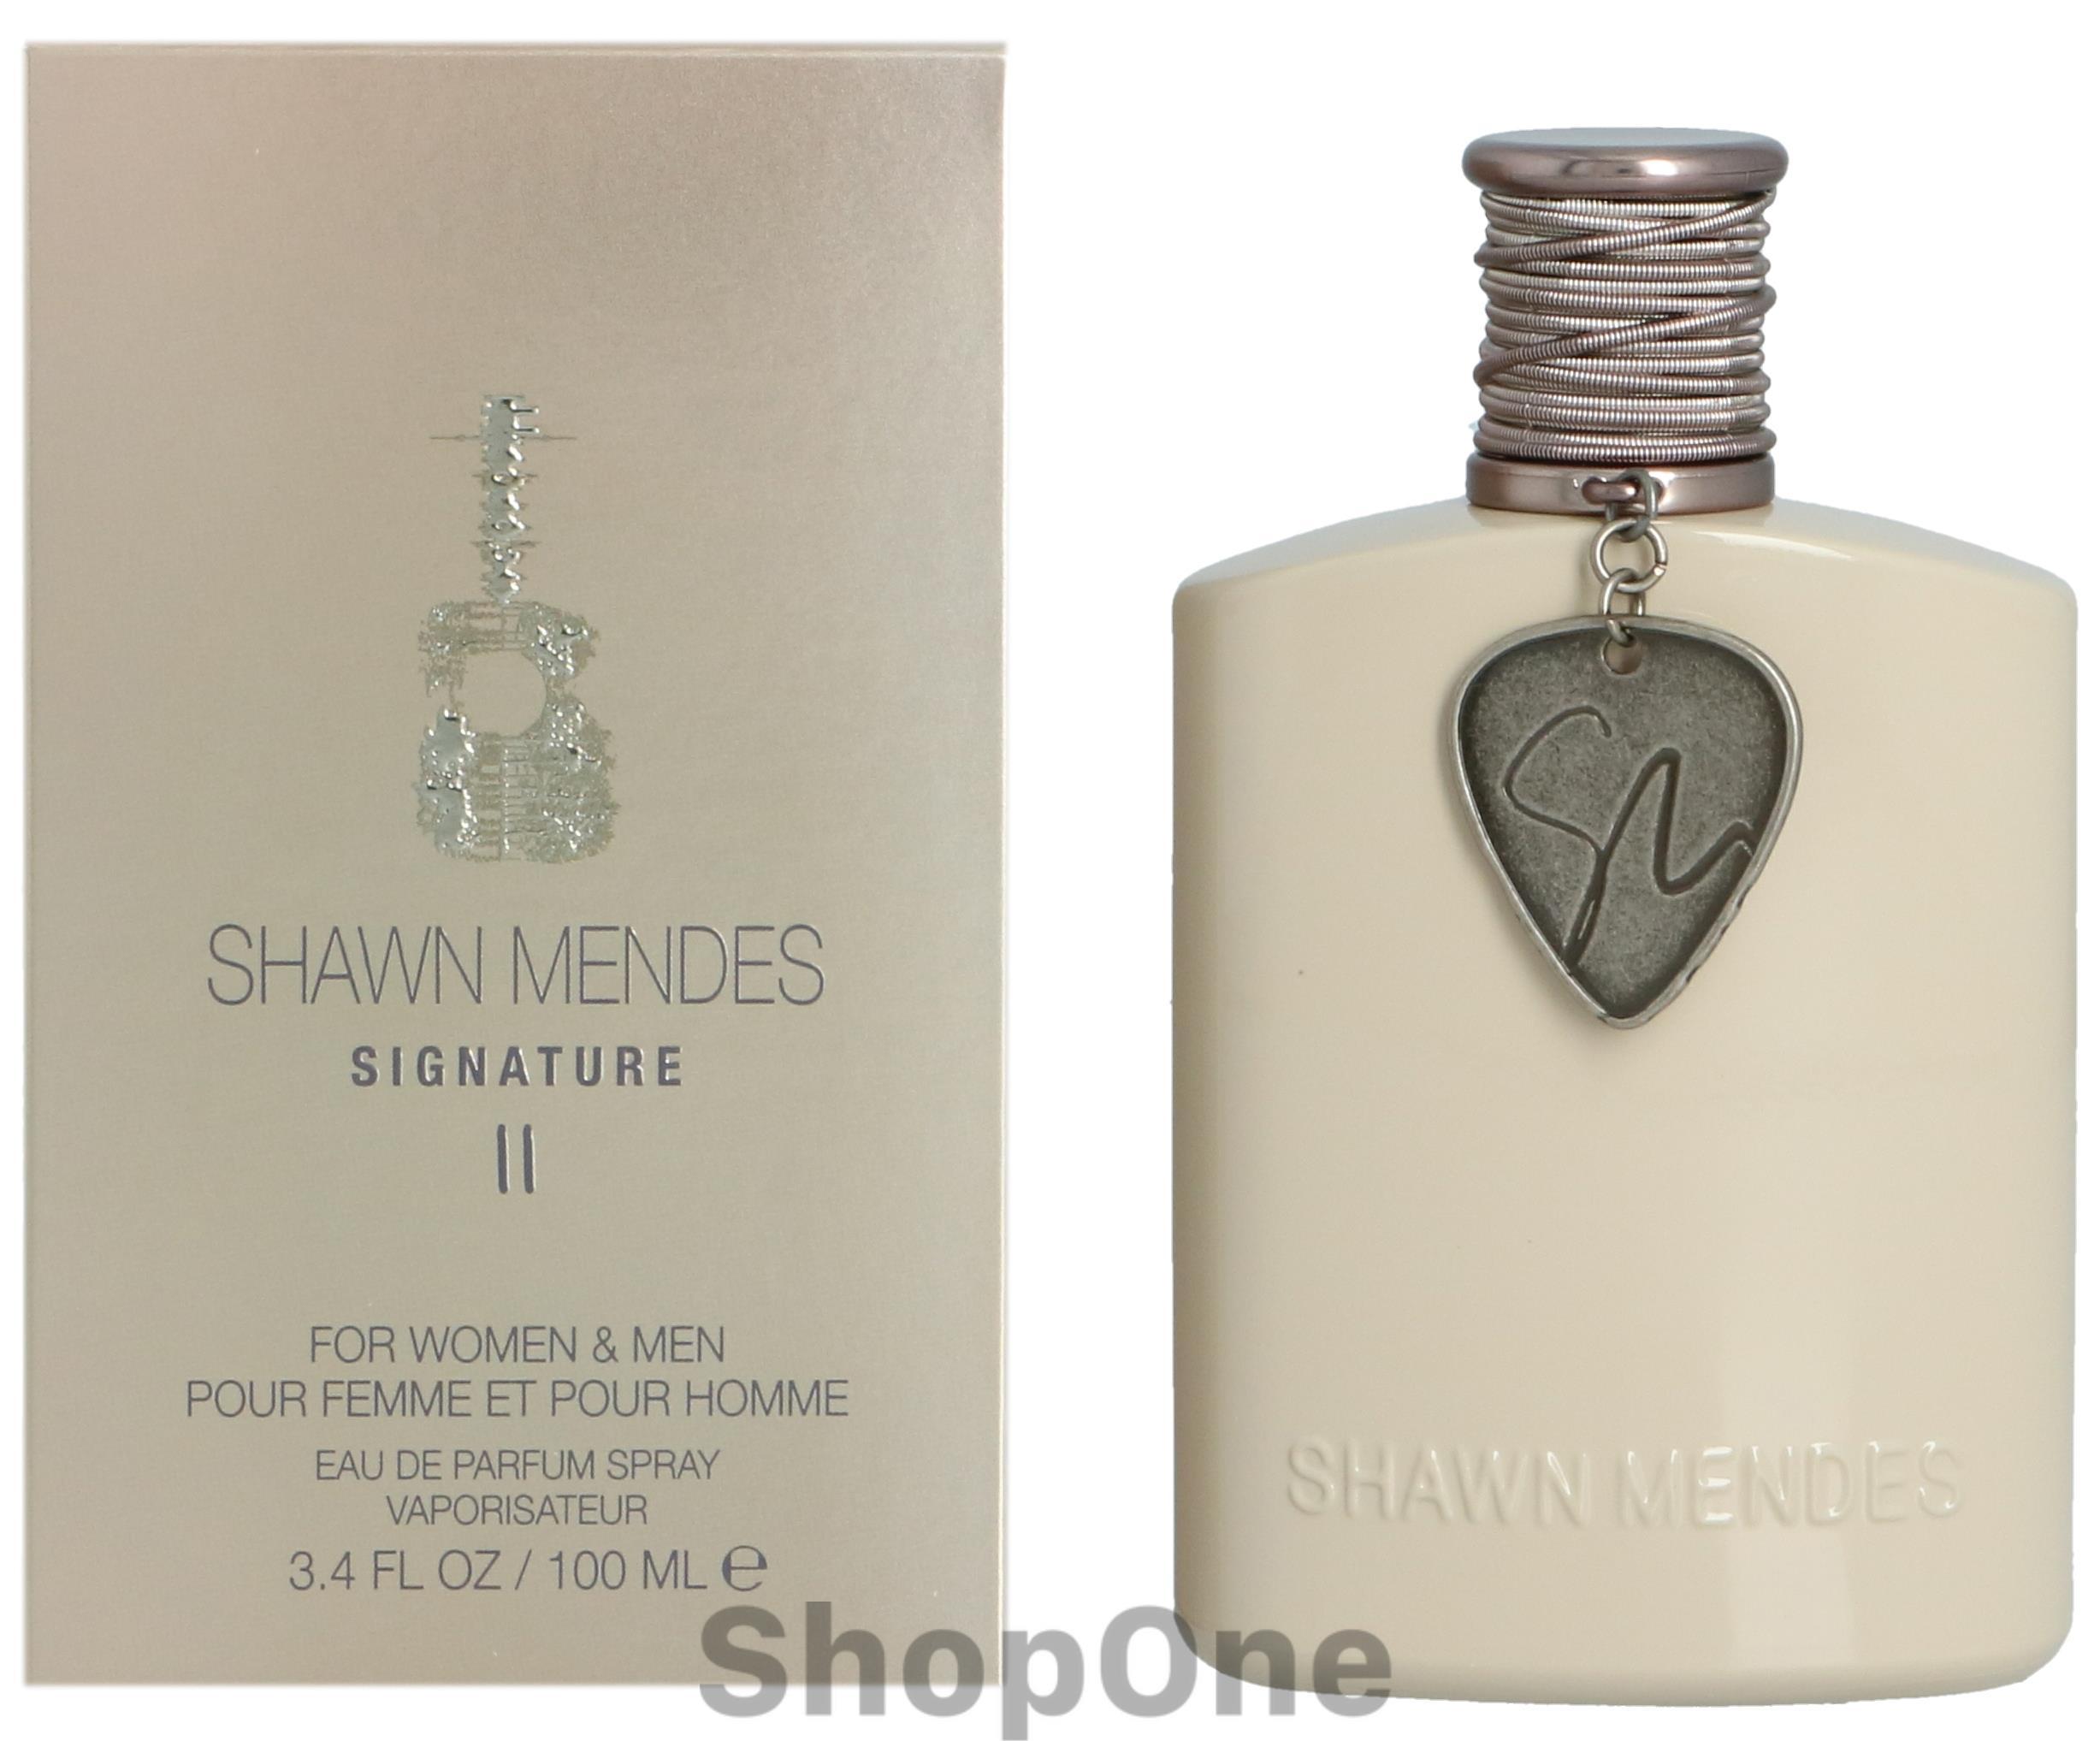 Signature II Edp Spray 100 ml fra Shawn Mendes - Damesgeuren Shawn Mendes Signature II Edp Spray 100 ml. Fra Shawn Mendes.